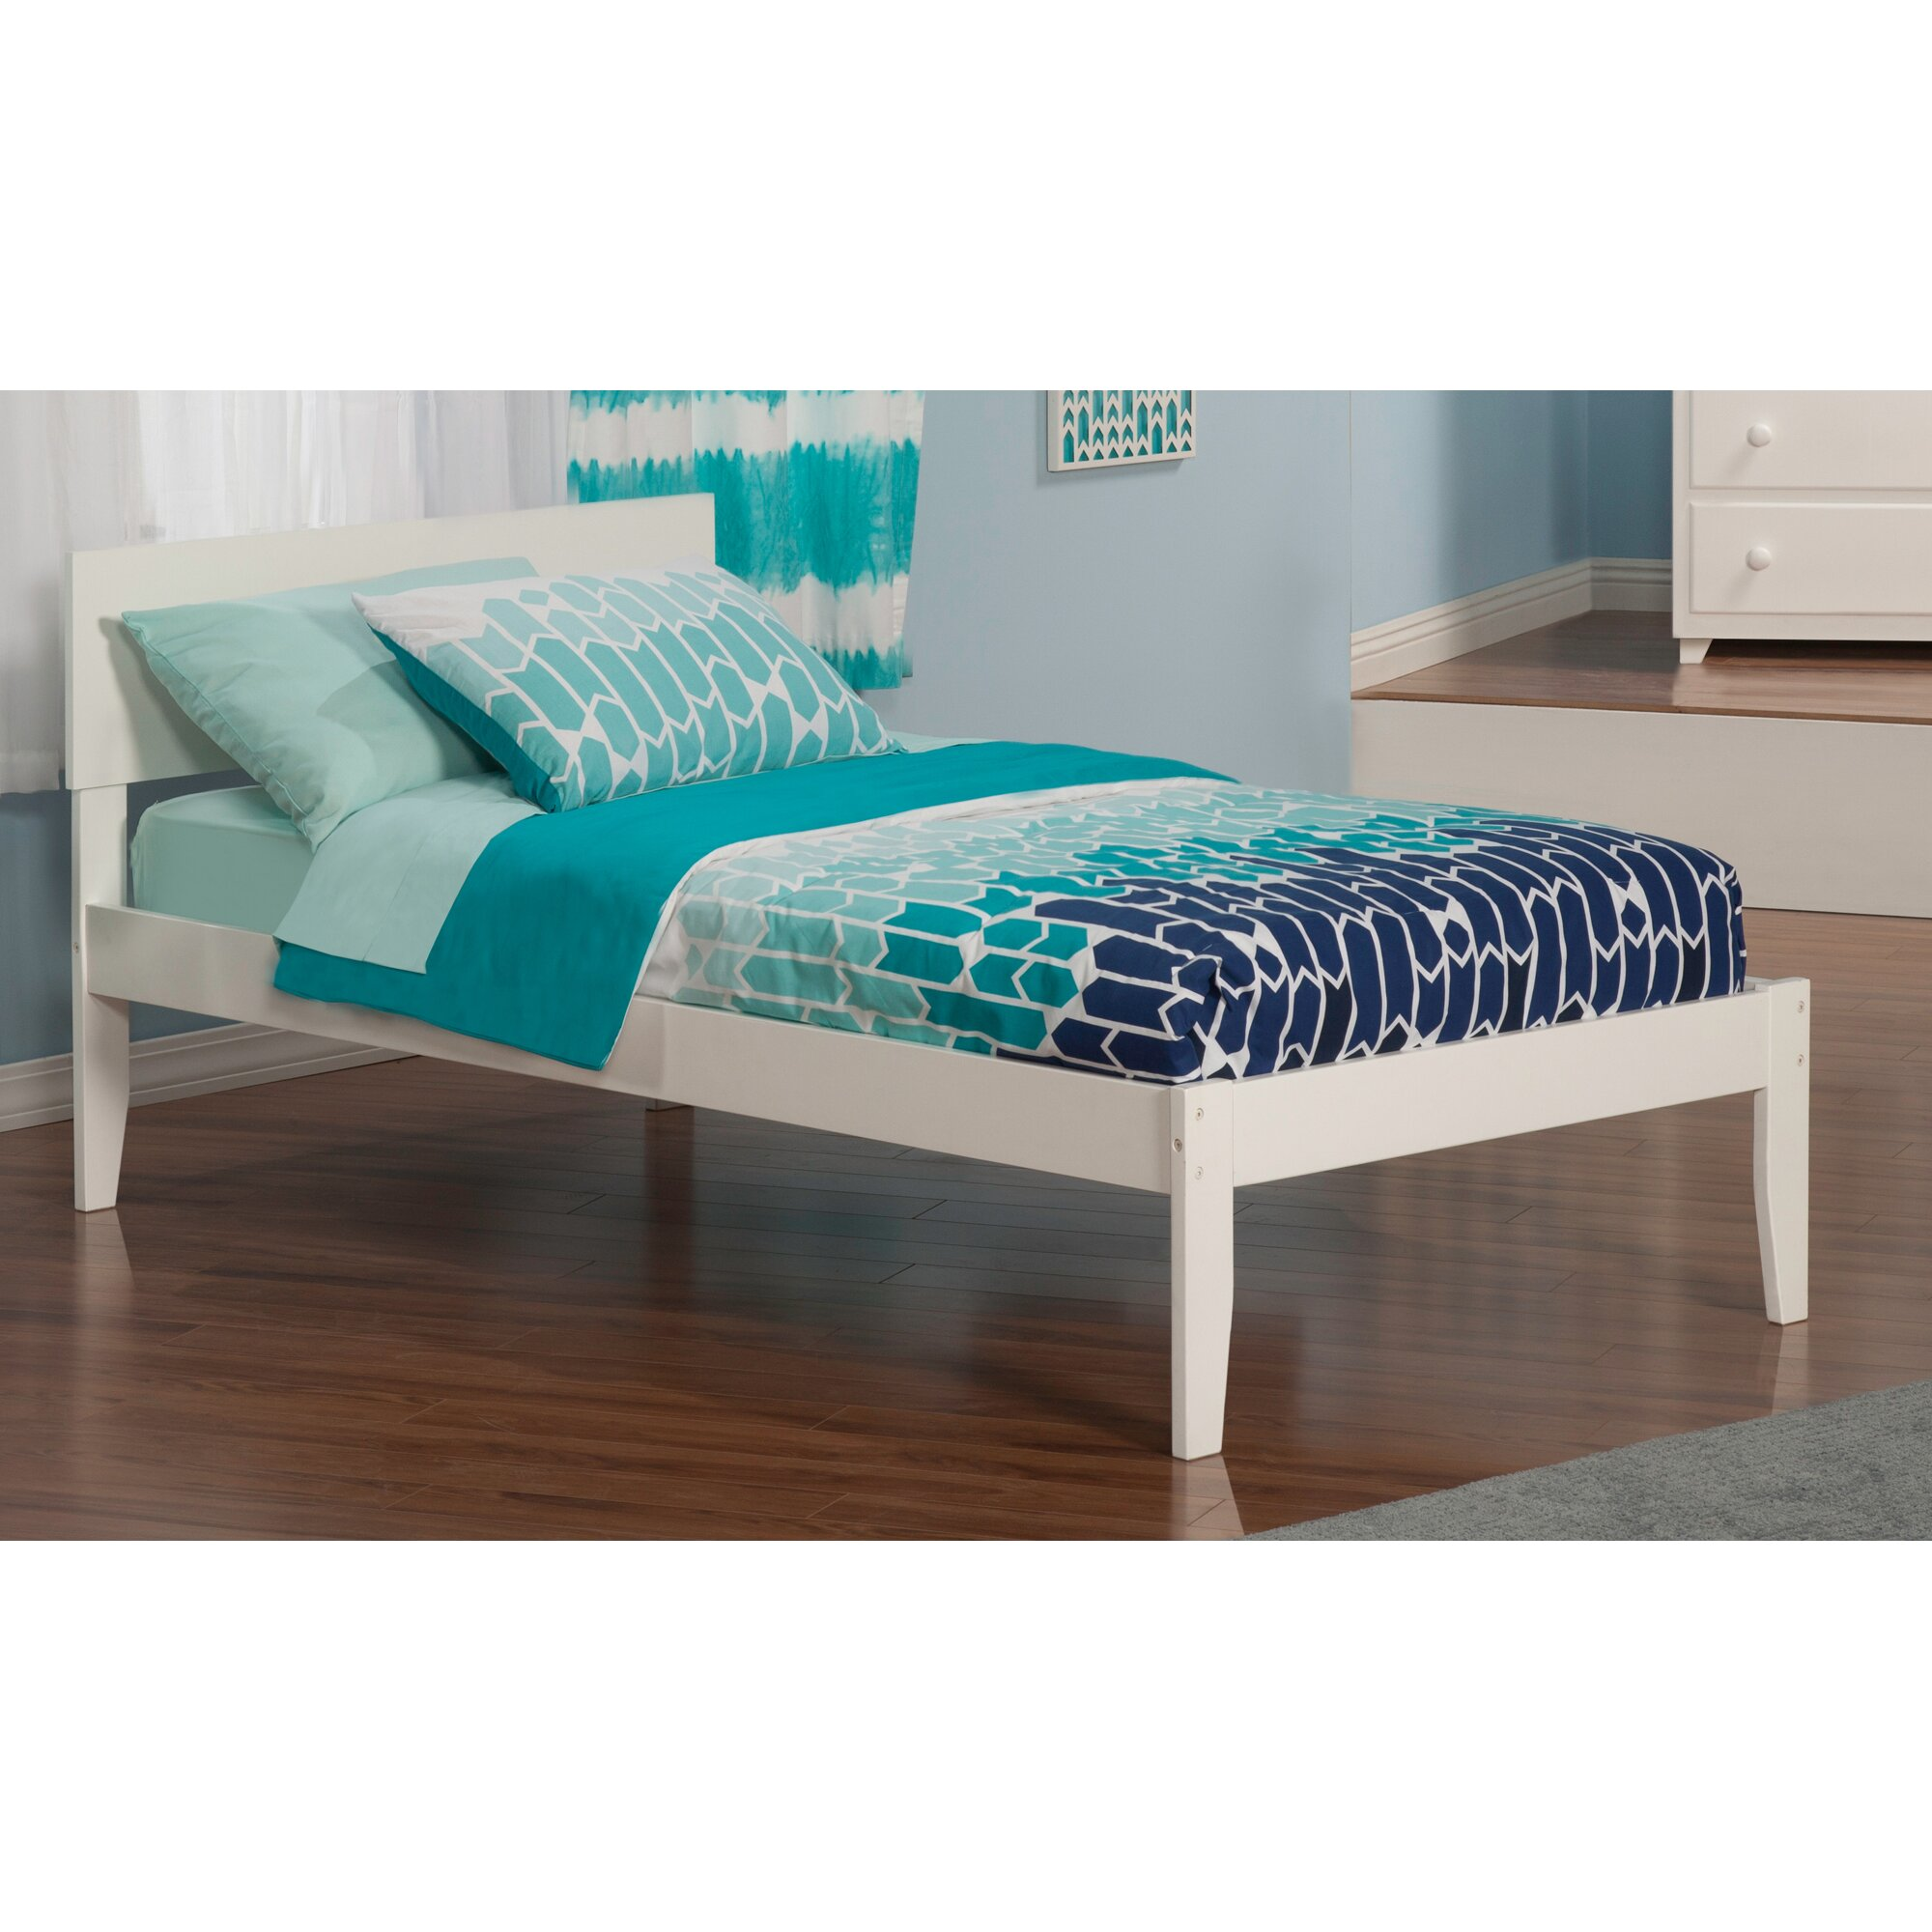 Atlantic Furniture Orlando Extra Long Twin Panel Bed